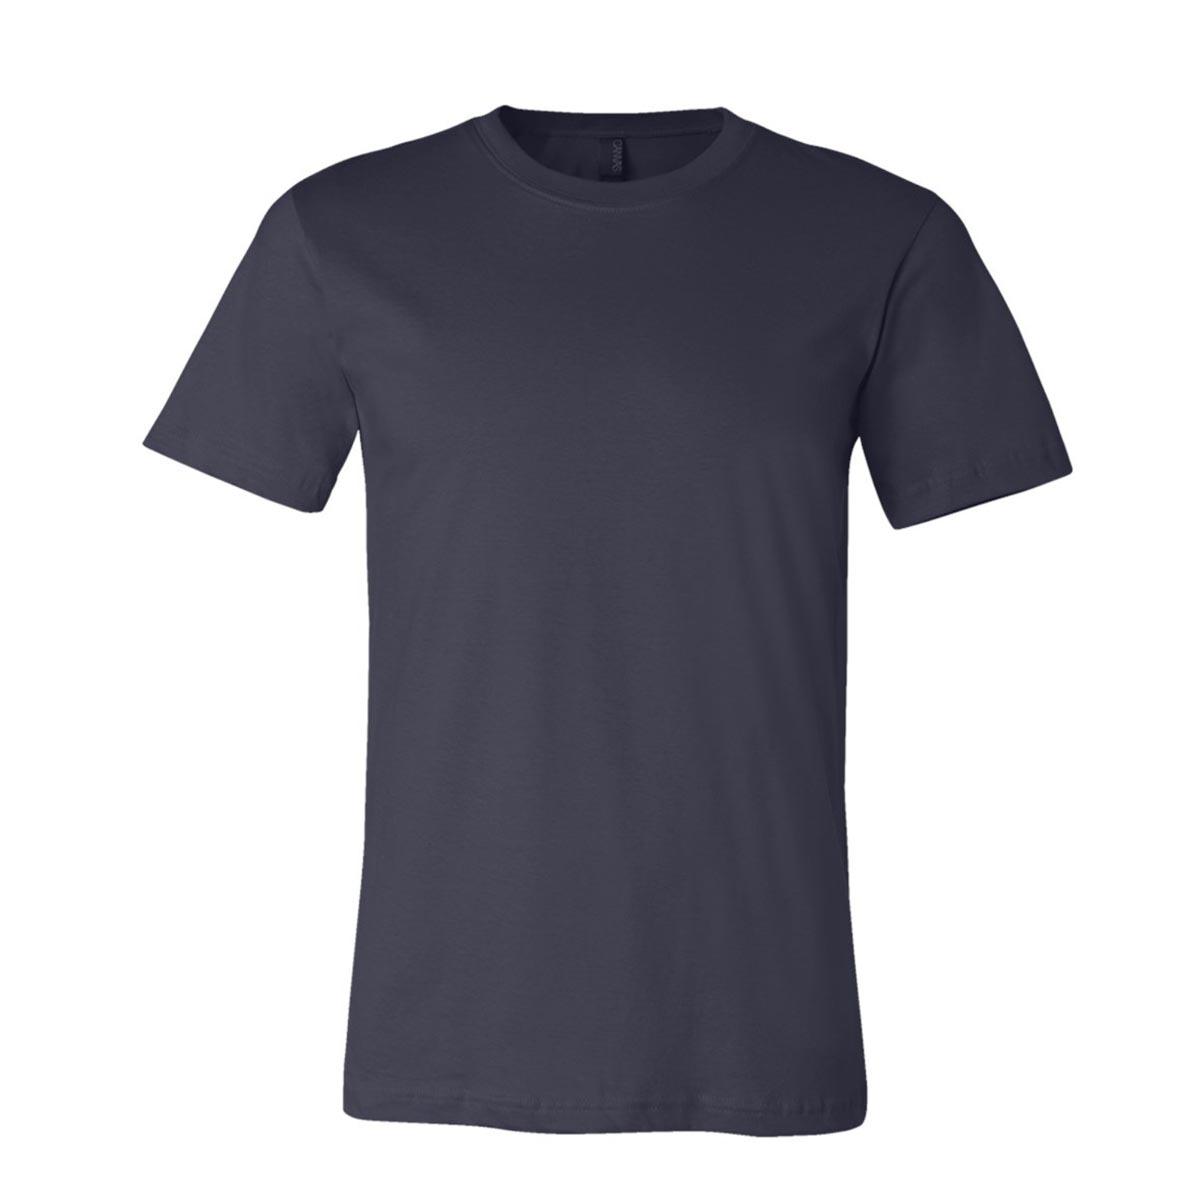 Navy bella jersey